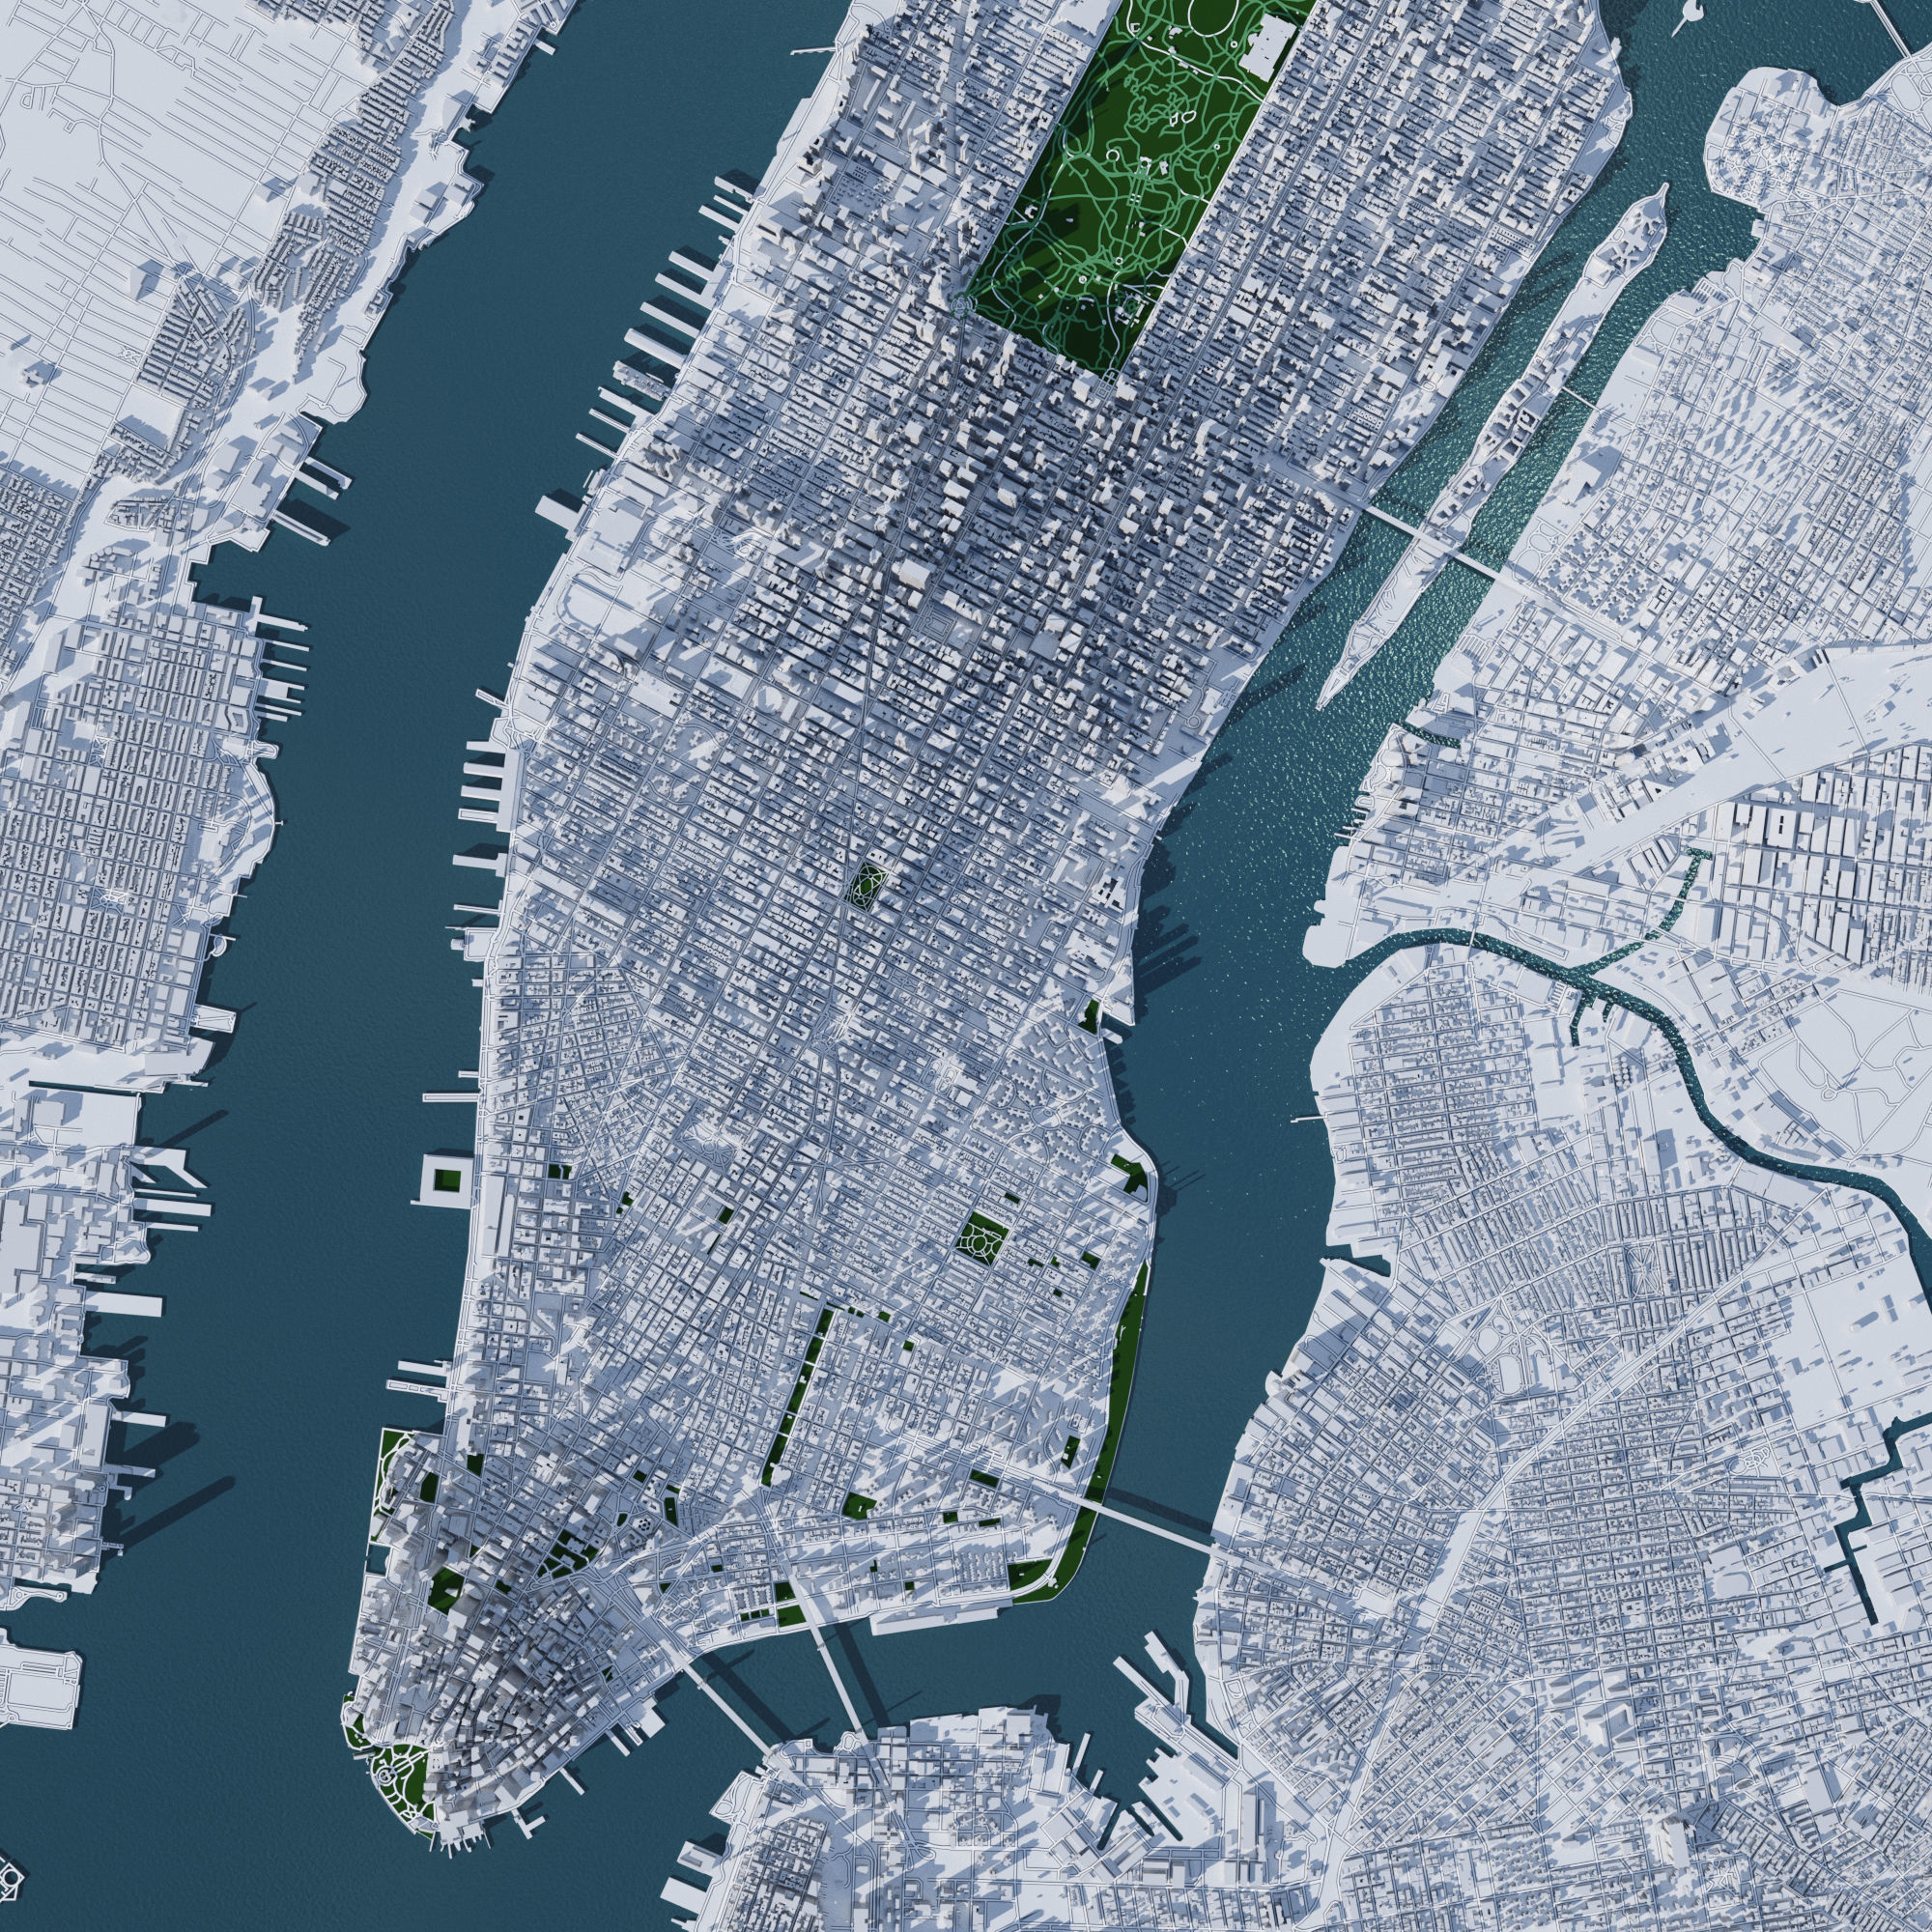 Map Of New York 3d.New York City Manhattan With Terrain 3d Model